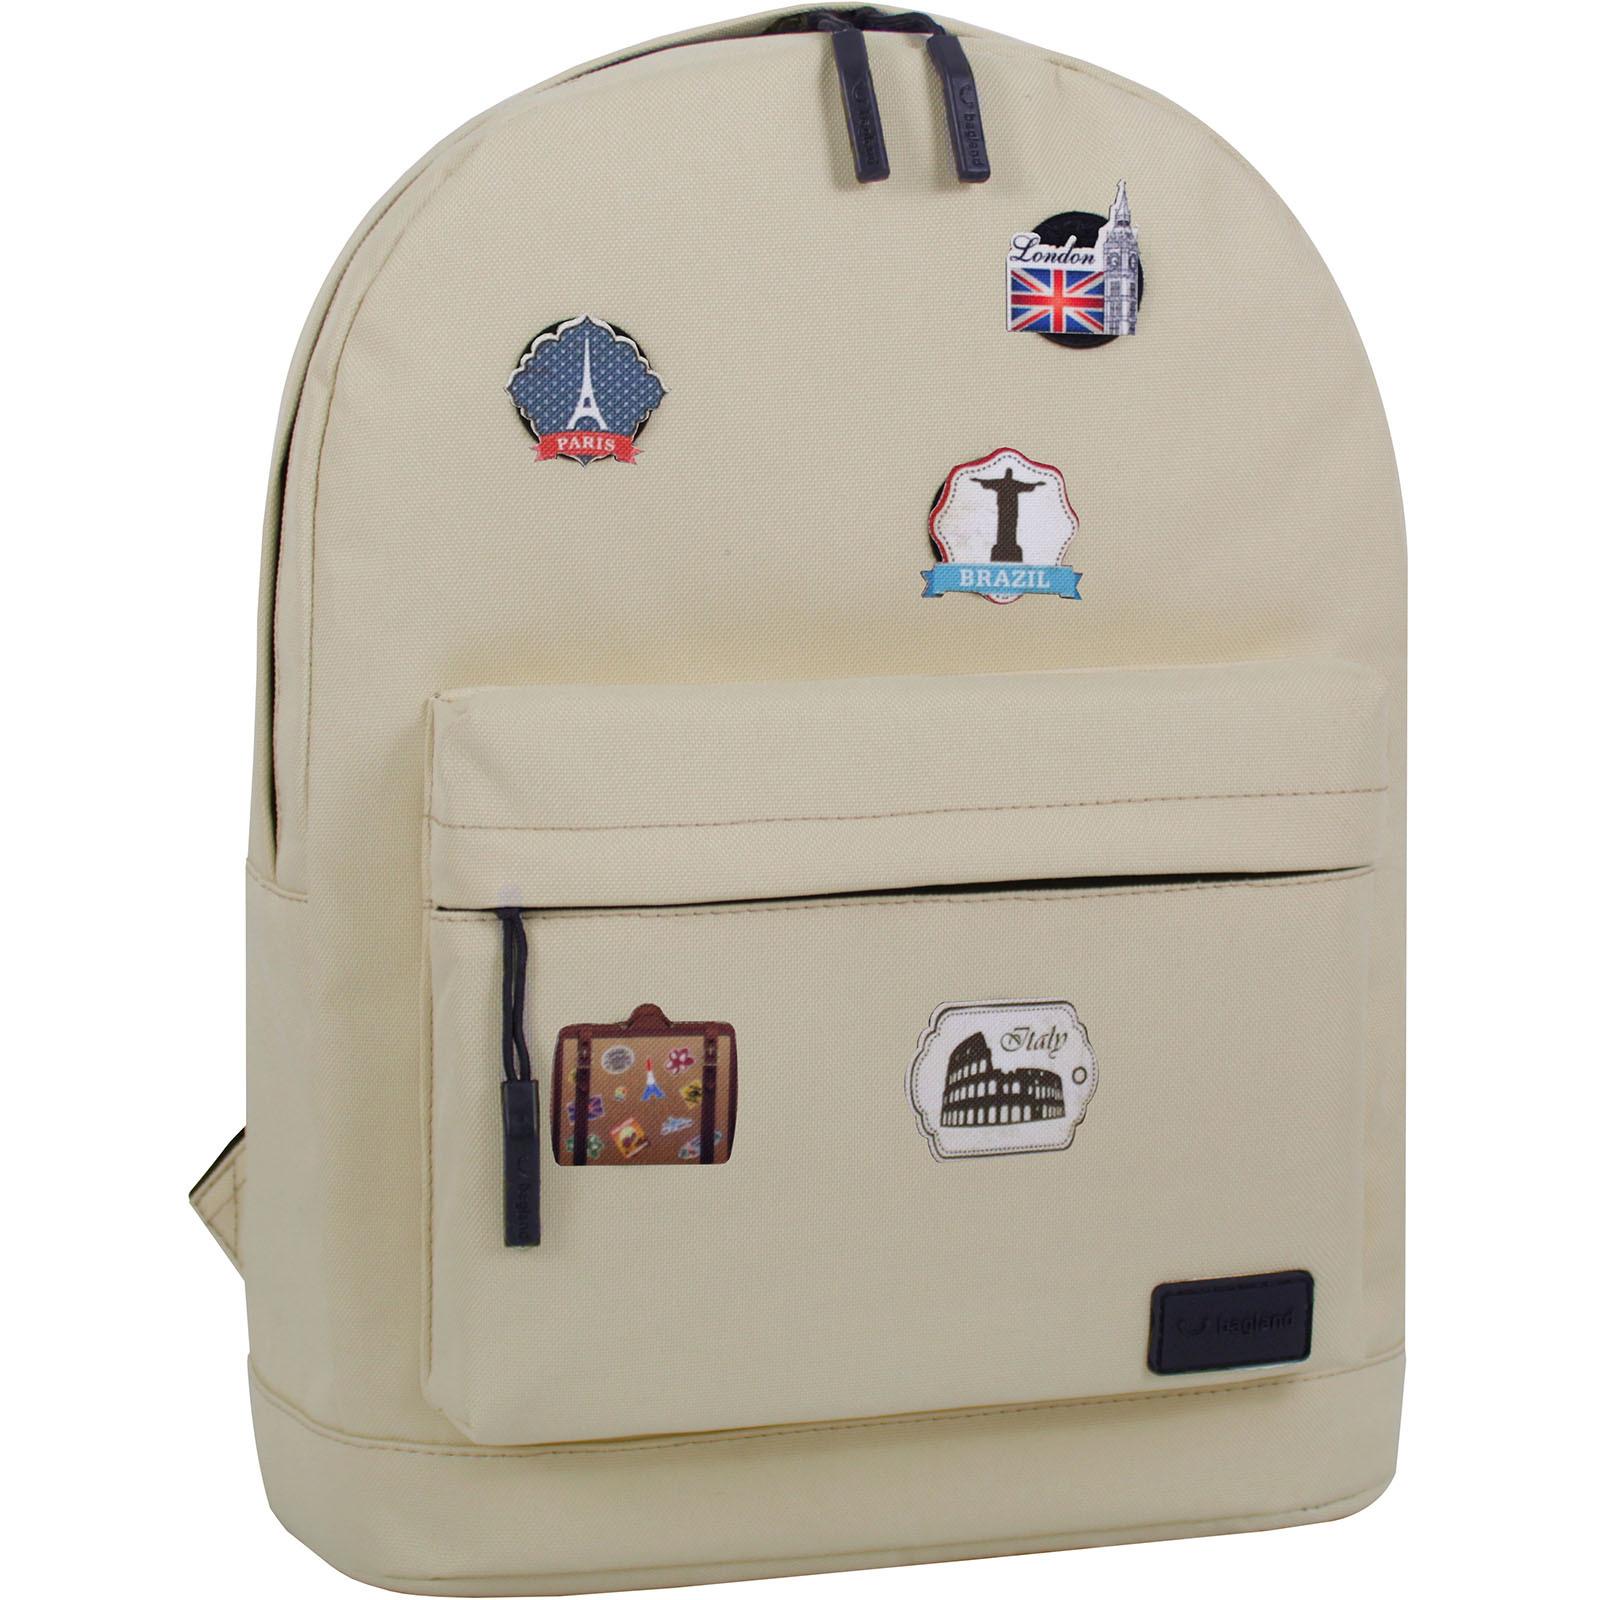 Рюкзак Bagland Молодежный W/R 17 л. 276 бежевый (00533662 Ш) фото 1